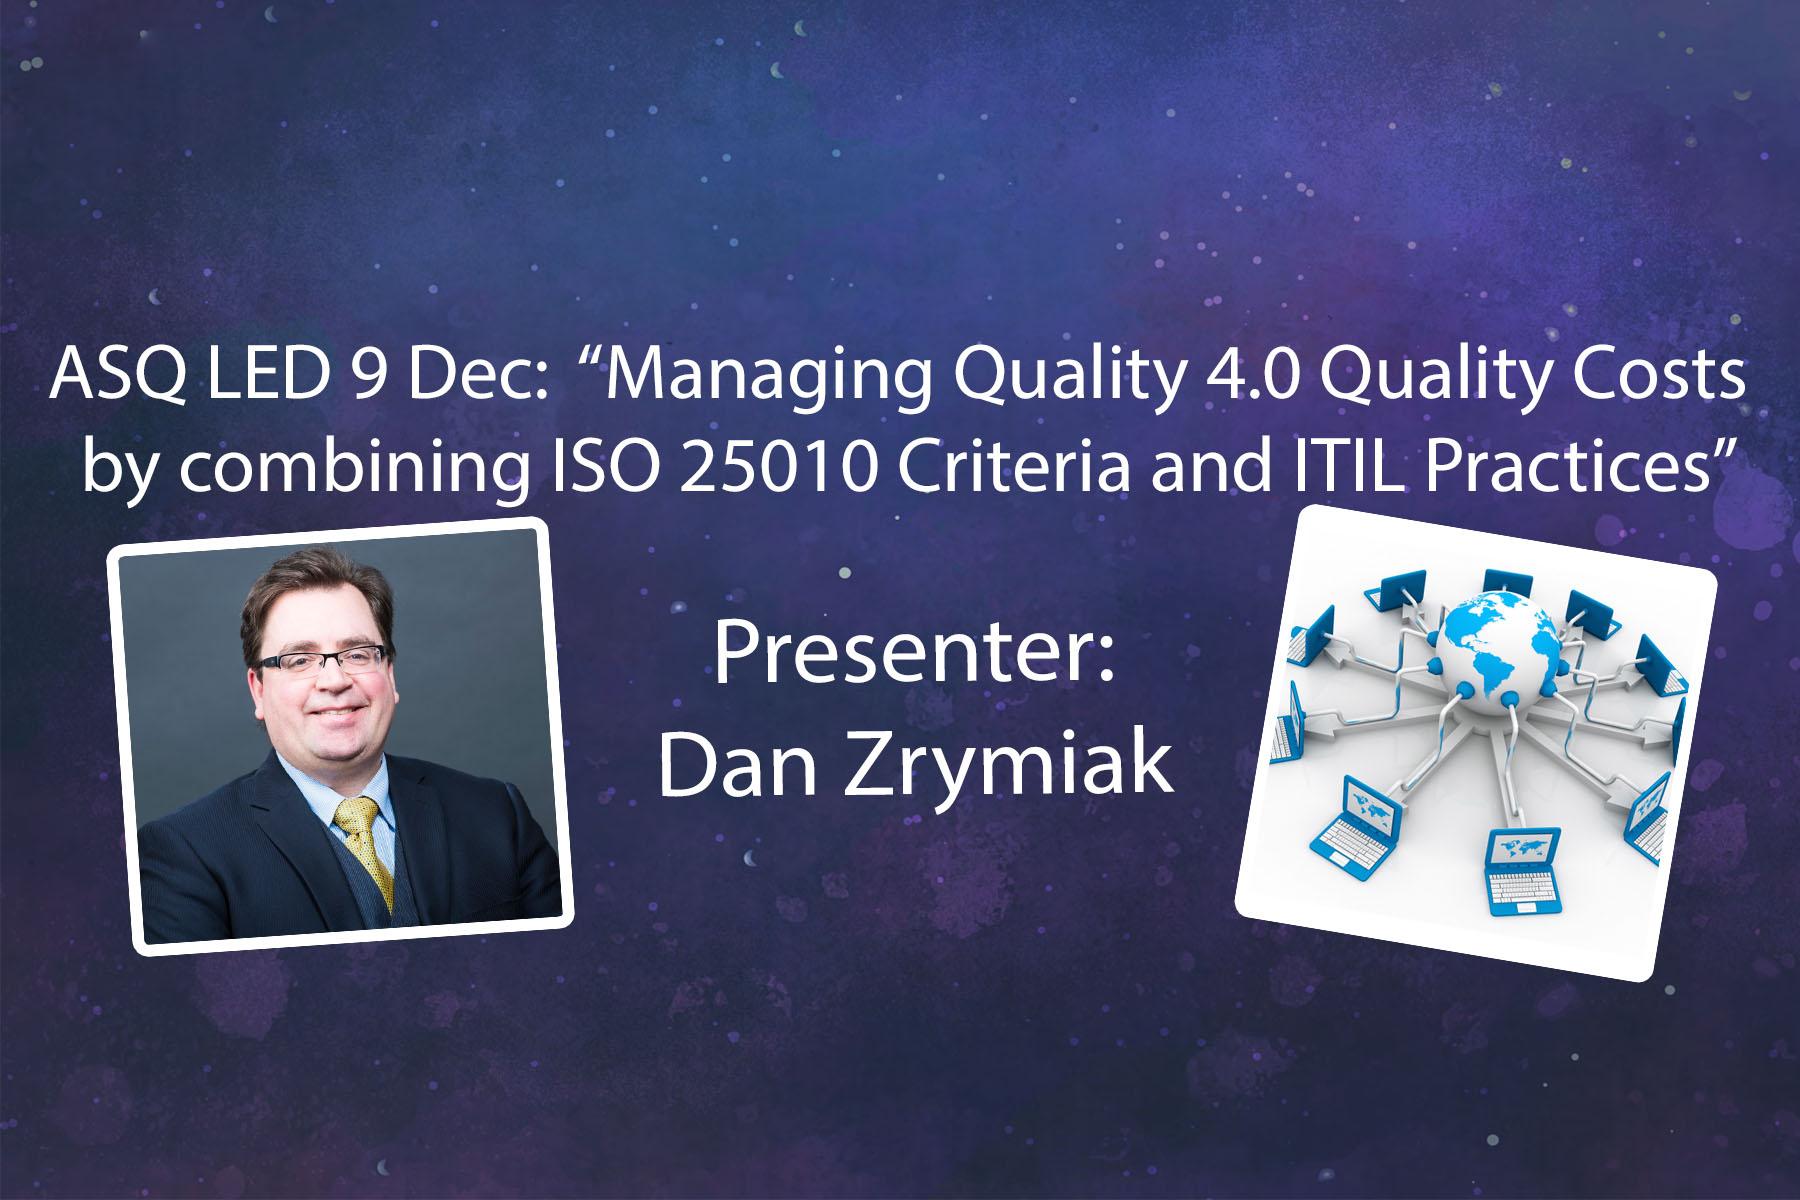 Dan Zrymiak Presents ASQ LED Webinar on Wednesday, December 9th 1530